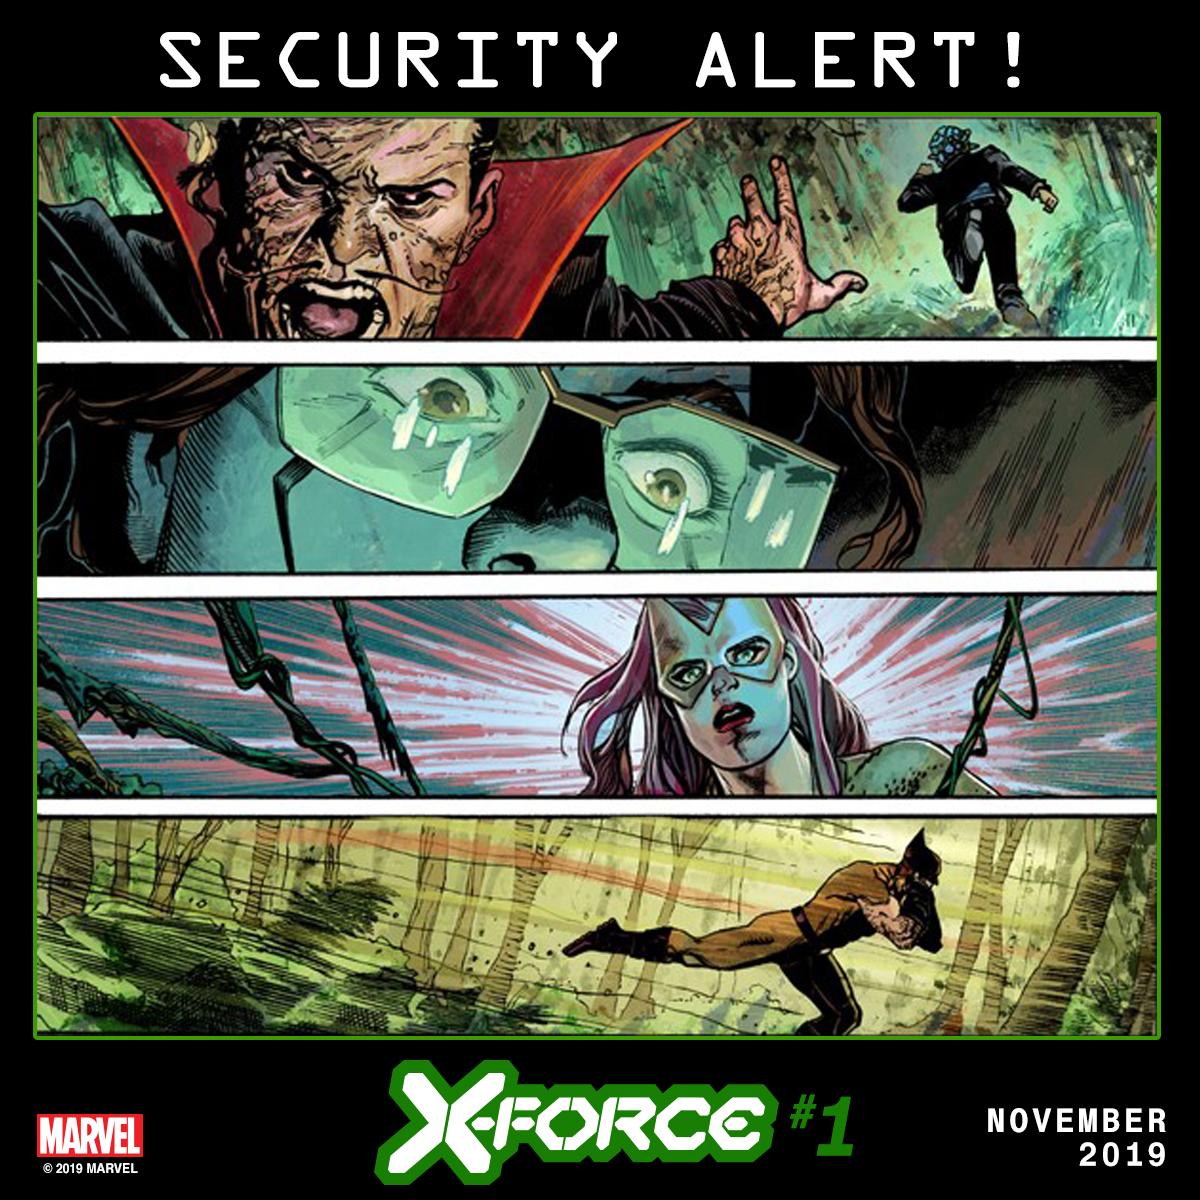 New X-FORCE teaser images hints at an emergency on Krakoa